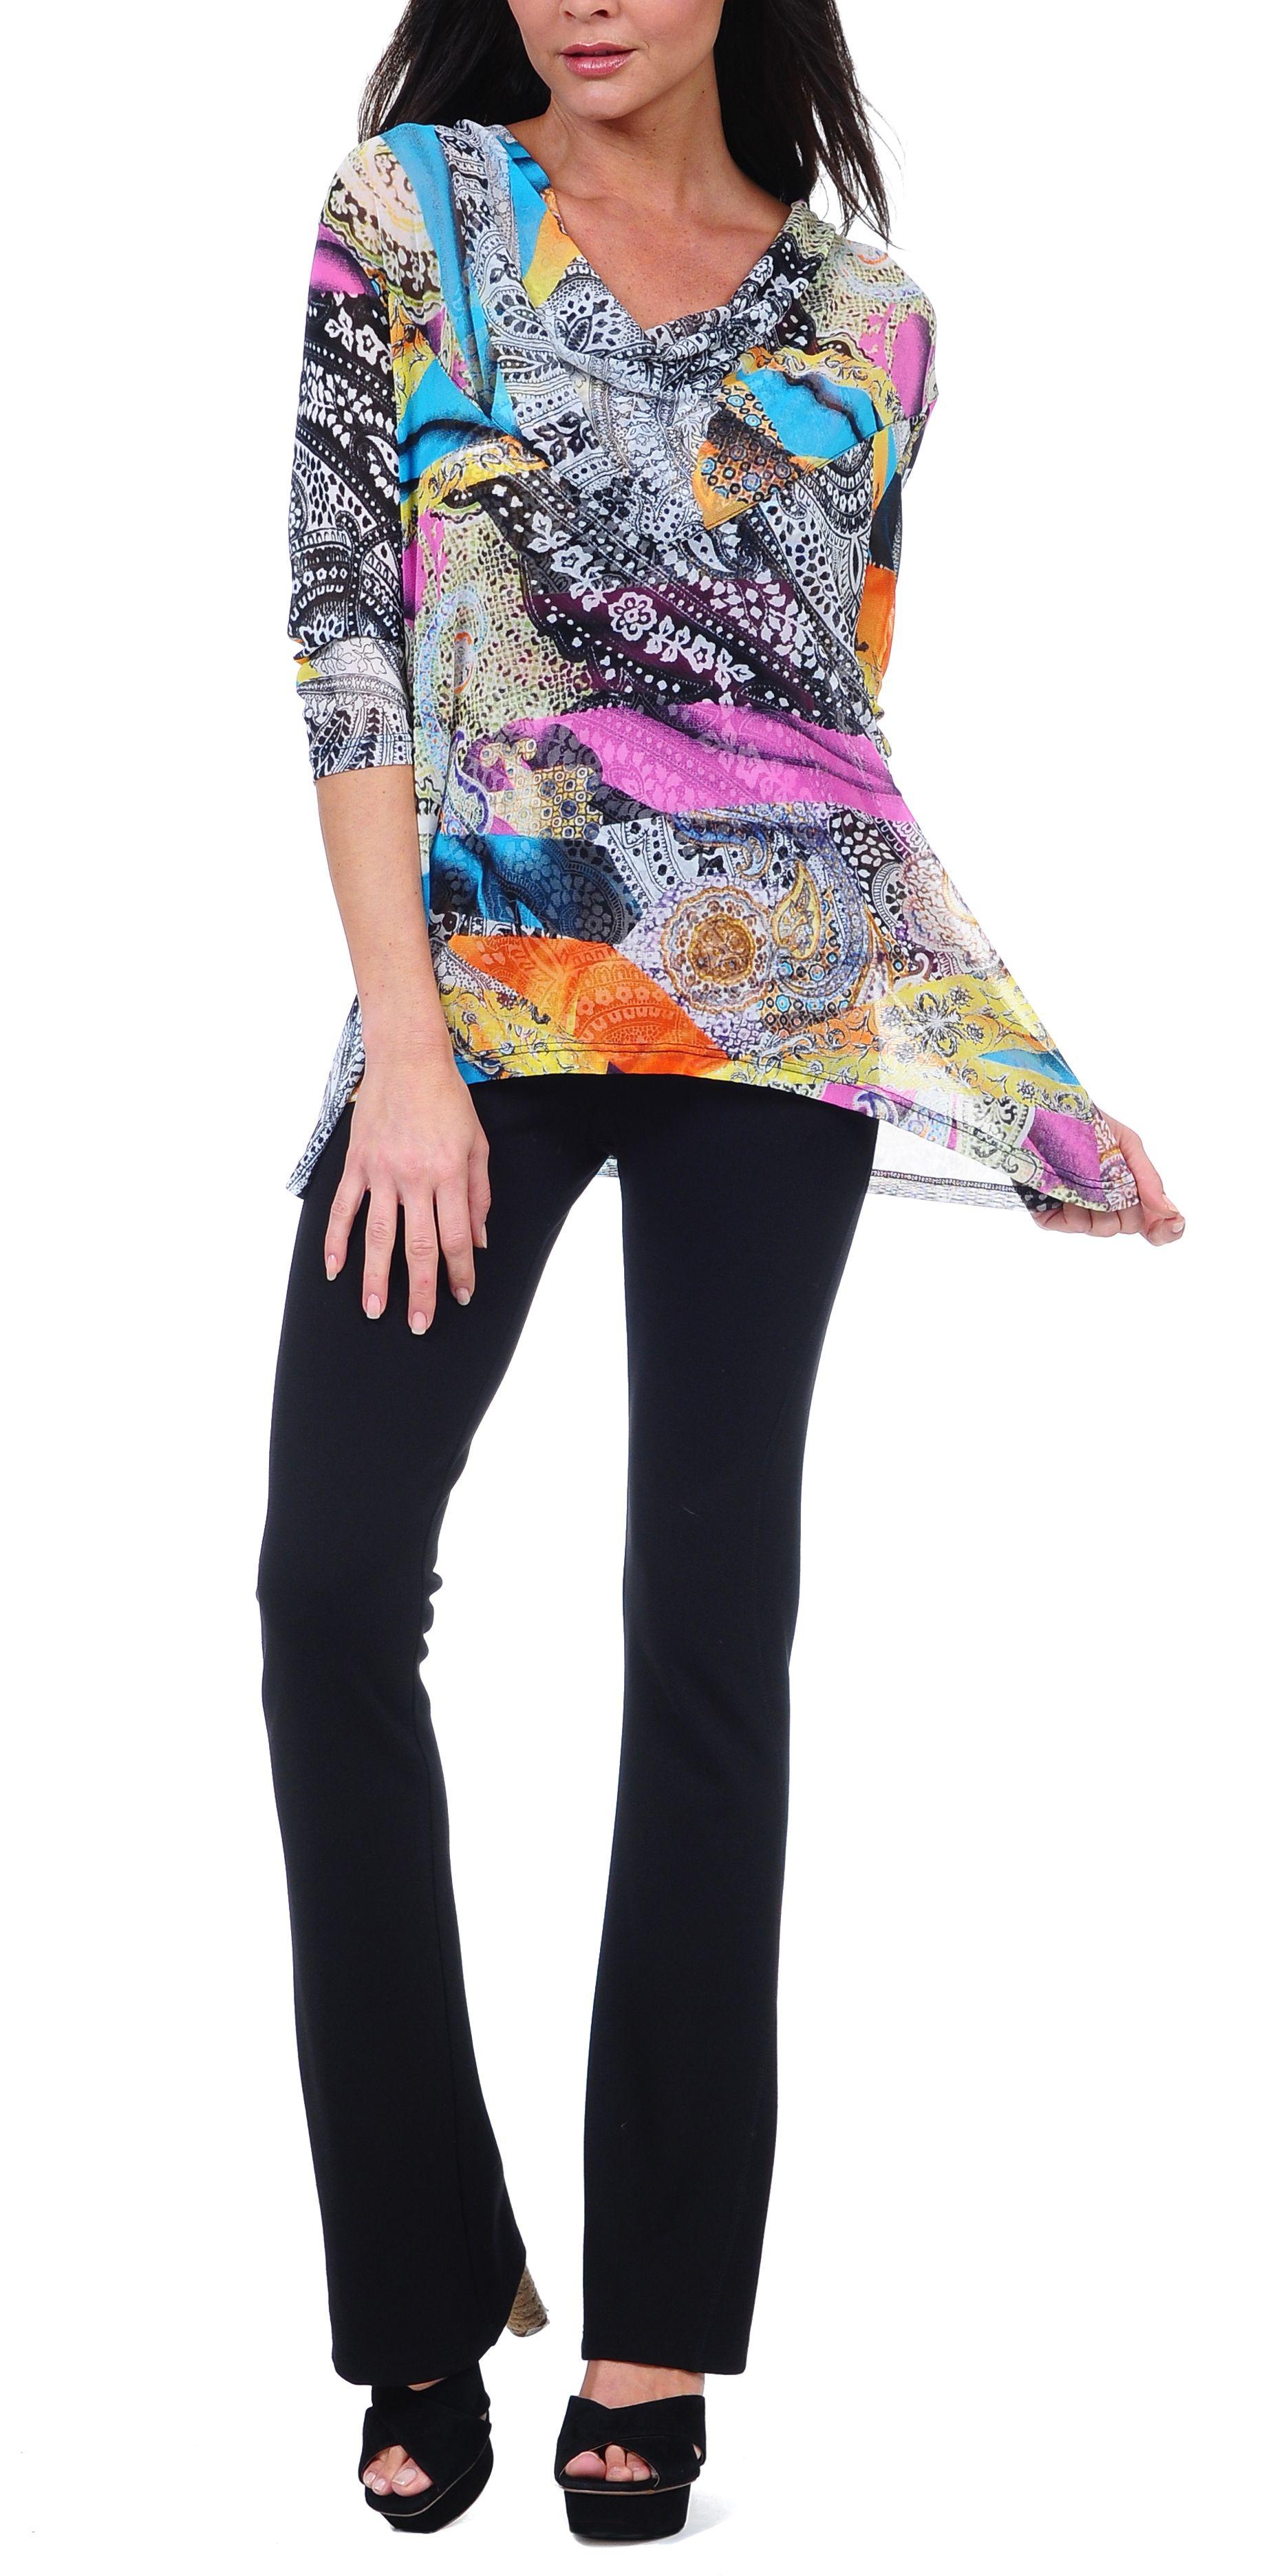 Lynn Ritchie Multi Colored Top